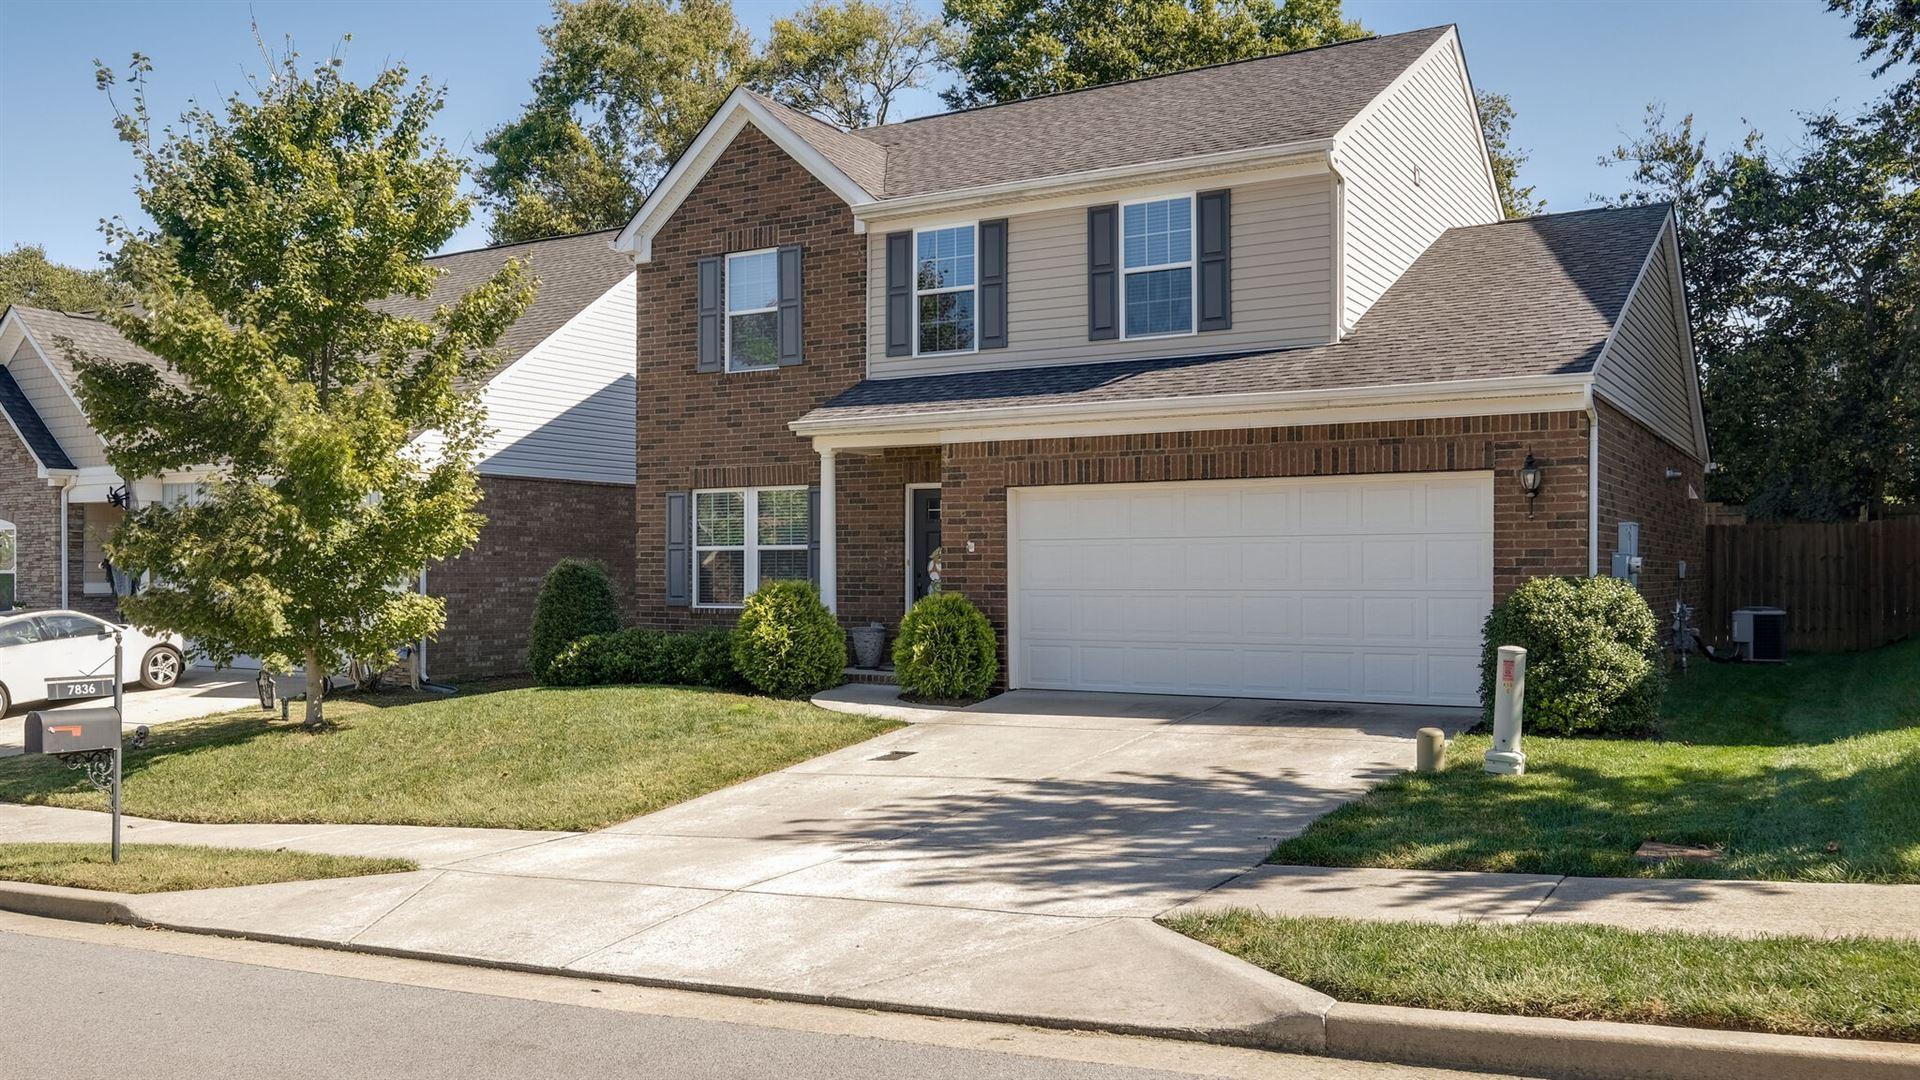 Photo of 7836 Oakfield Grv, Brentwood, TN 37027 (MLS # 2303214)